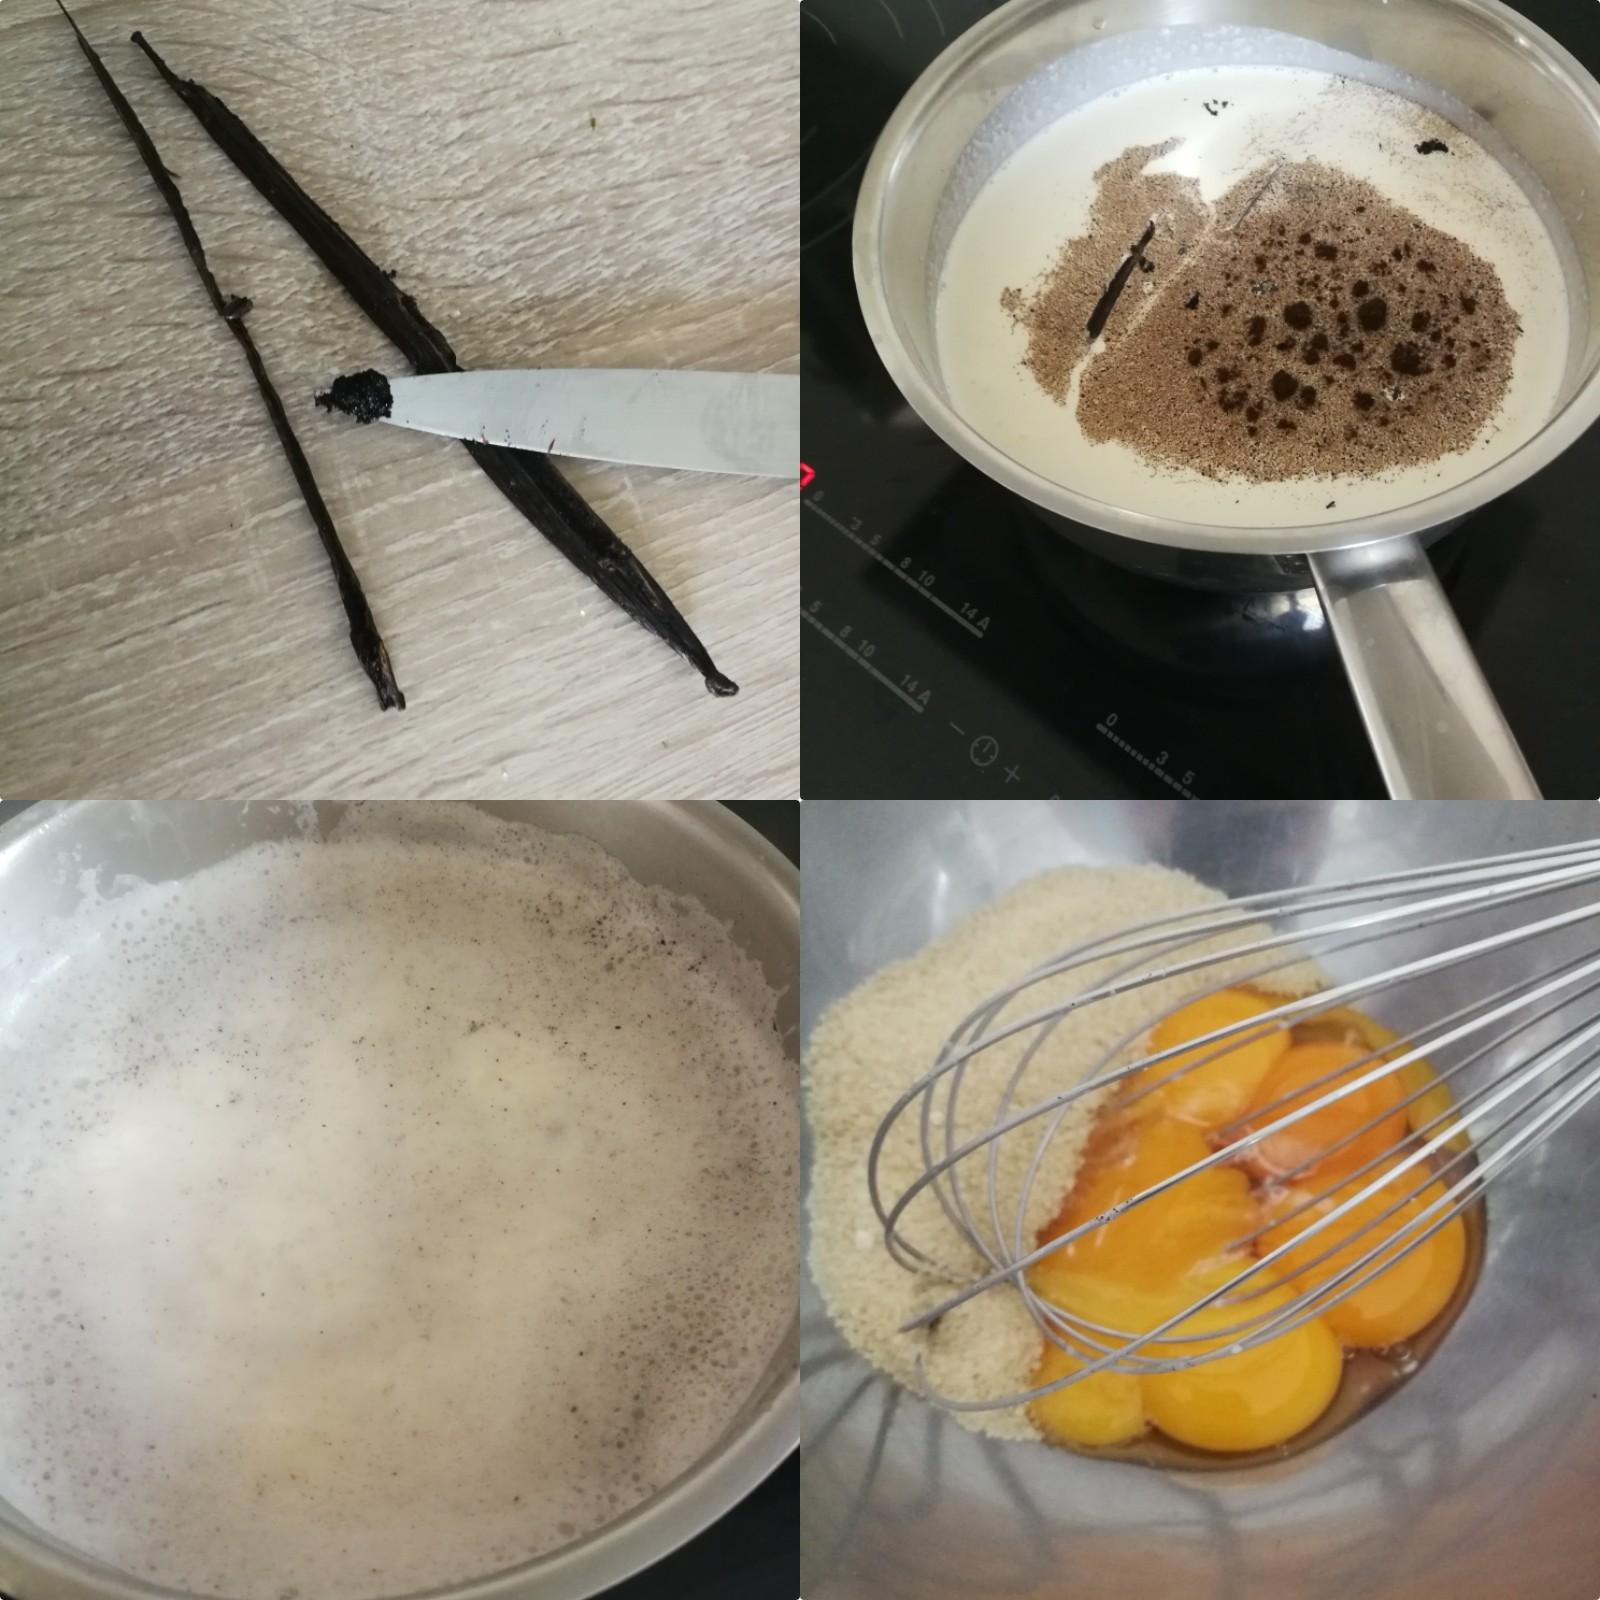 insert crème brulée